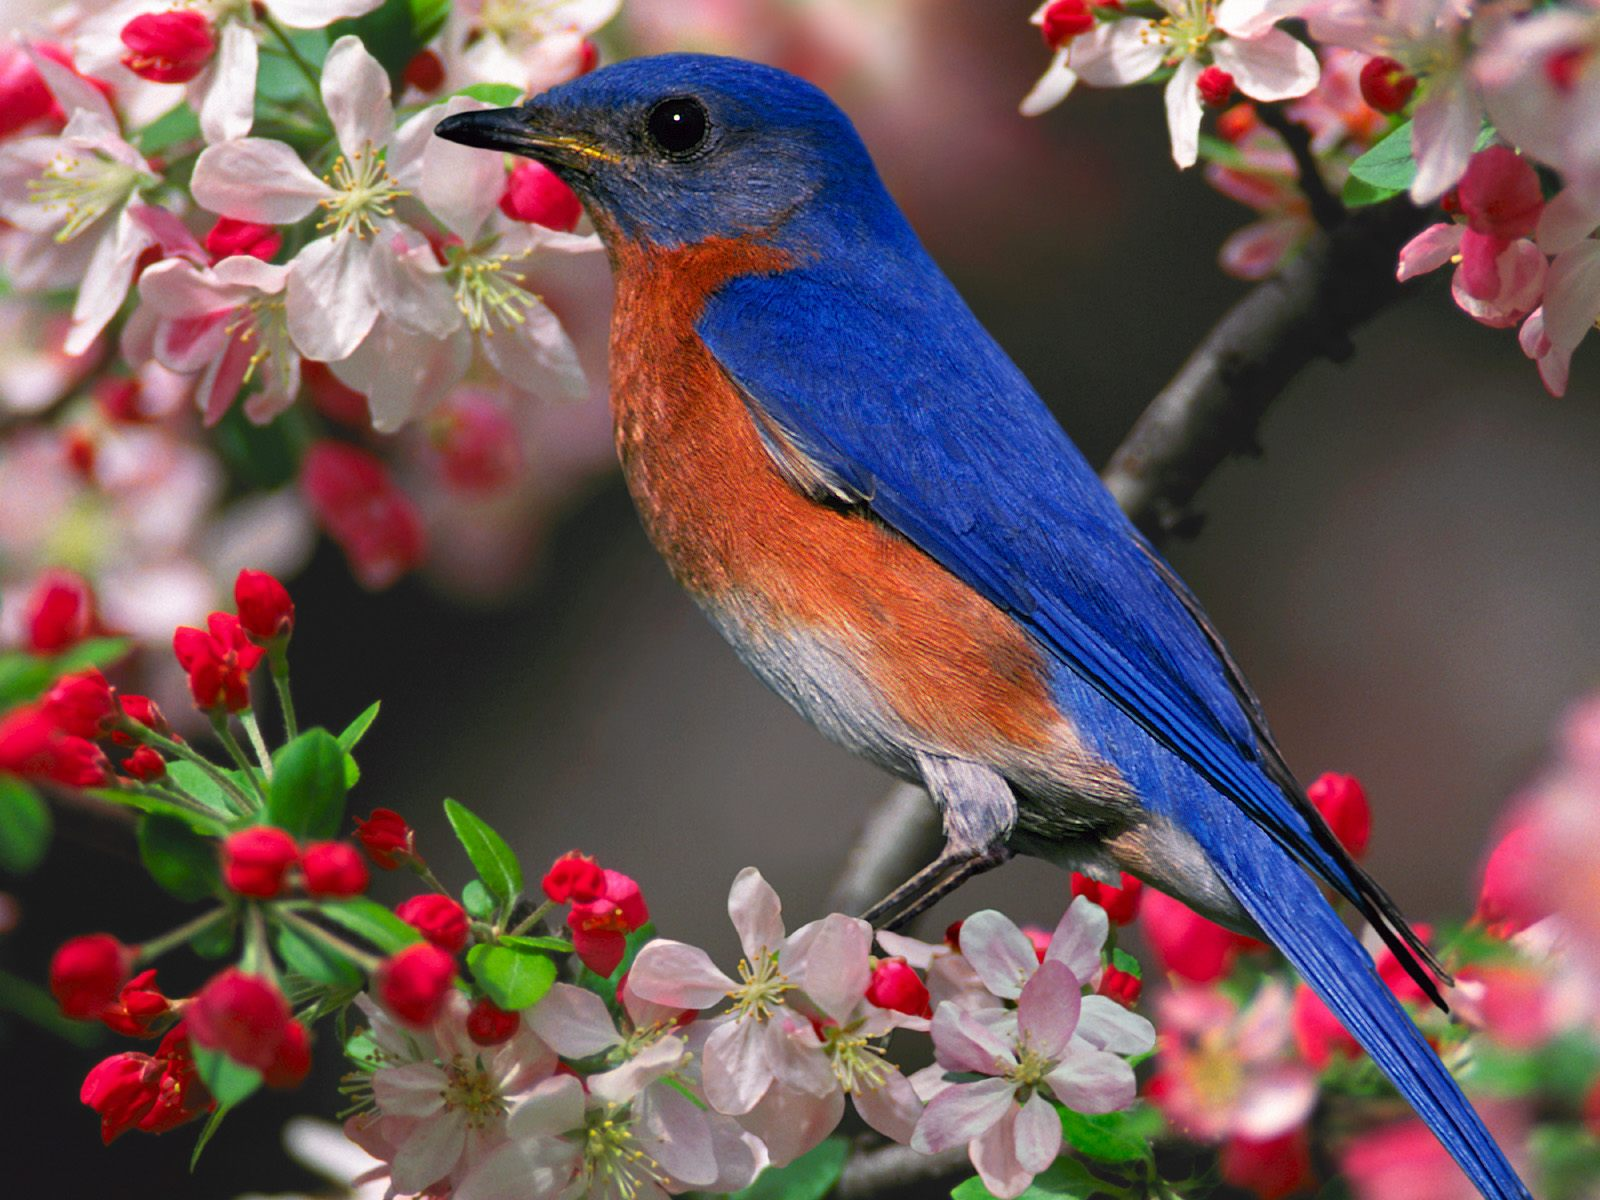 http://3.bp.blogspot.com/_i1EhHAR8ahM/S9m8fx0gLKI/AAAAAAAABrA/Tj2cThISebI/s1600/beautiful_bird_1600x1200.JPG